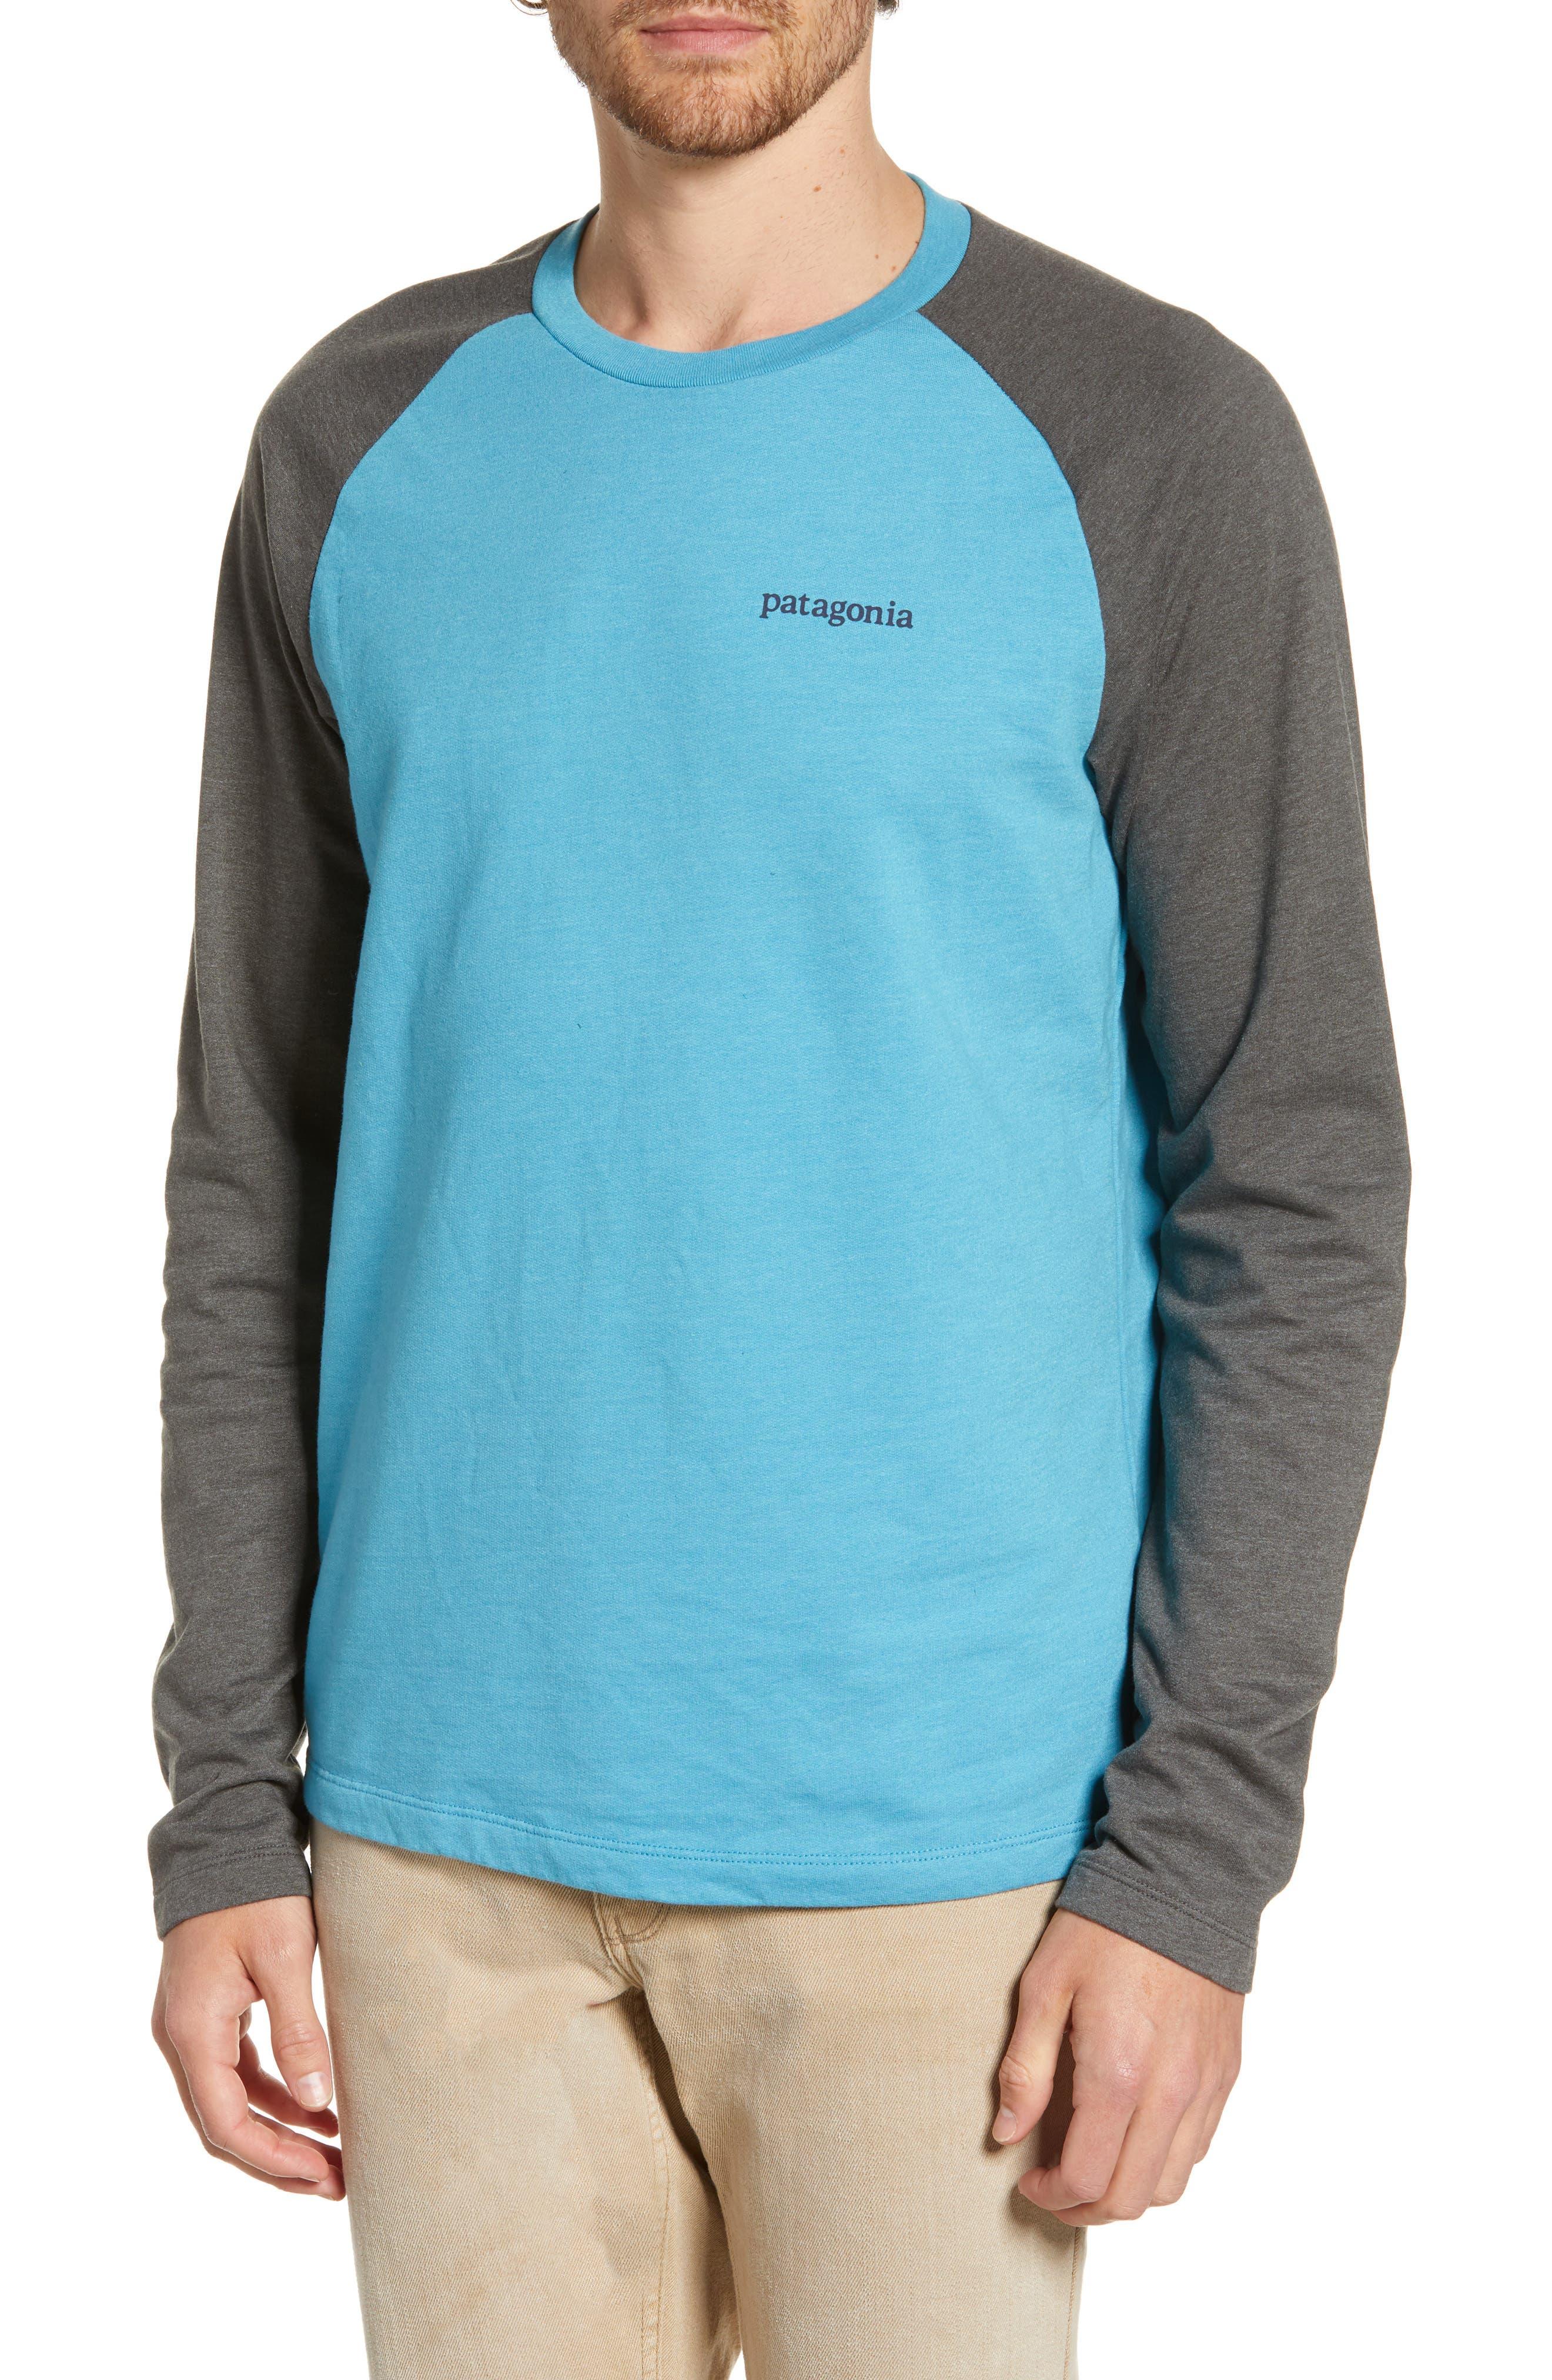 Patagonia Line Ridge Logo Graphic Sweatshirt